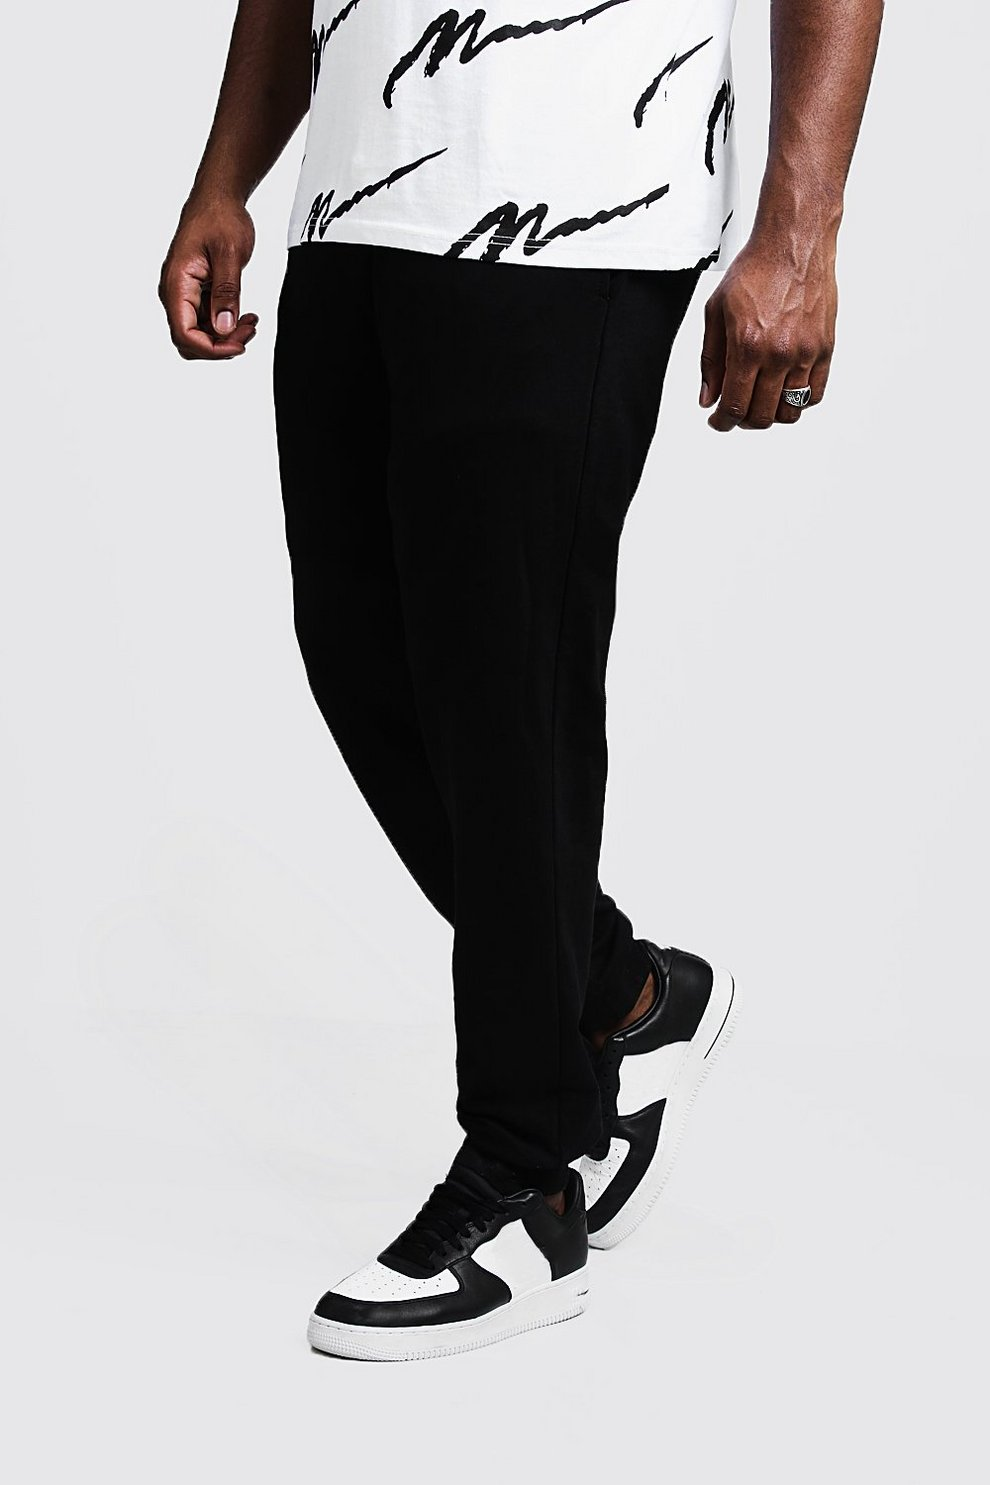 37aac882199423 Mens Black Big And Tall Boohoo Man Joggers